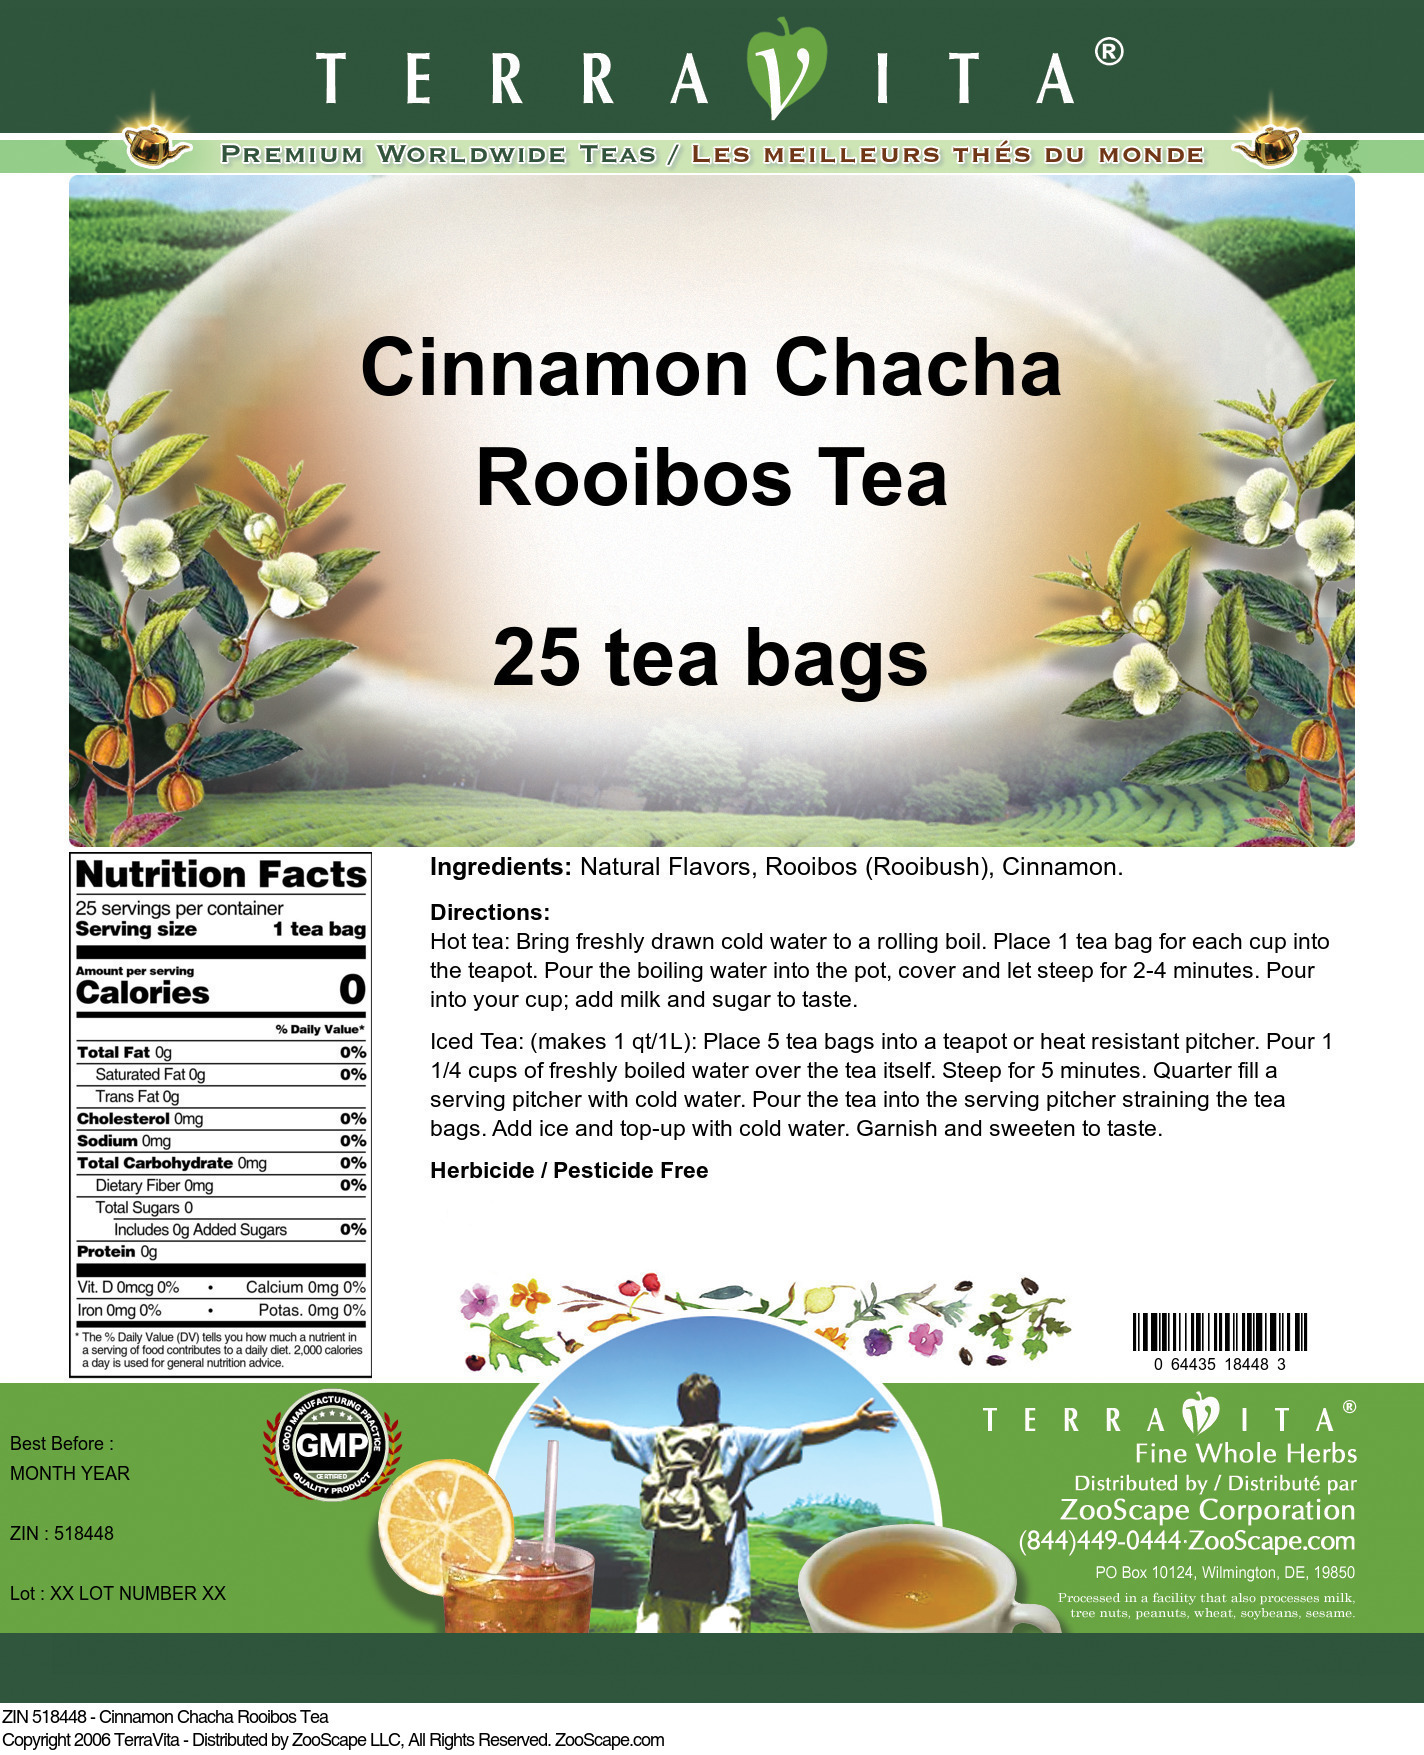 Cinnamon Chacha Rooibos Tea